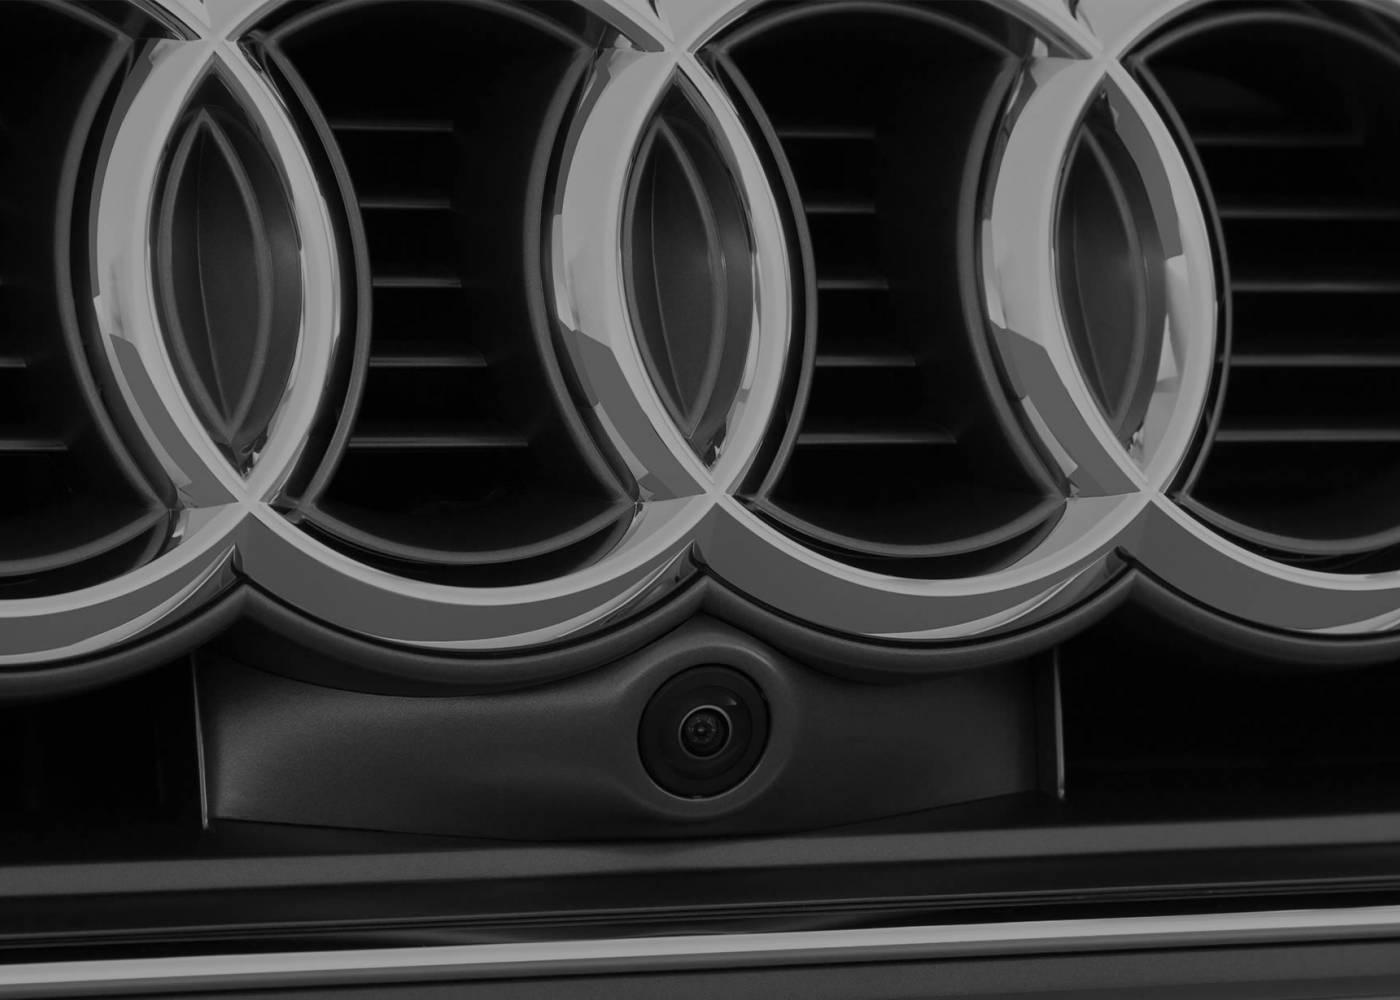 Audi Canada Best New Car Deals Offers LeaseCosts Canada - Audi canada